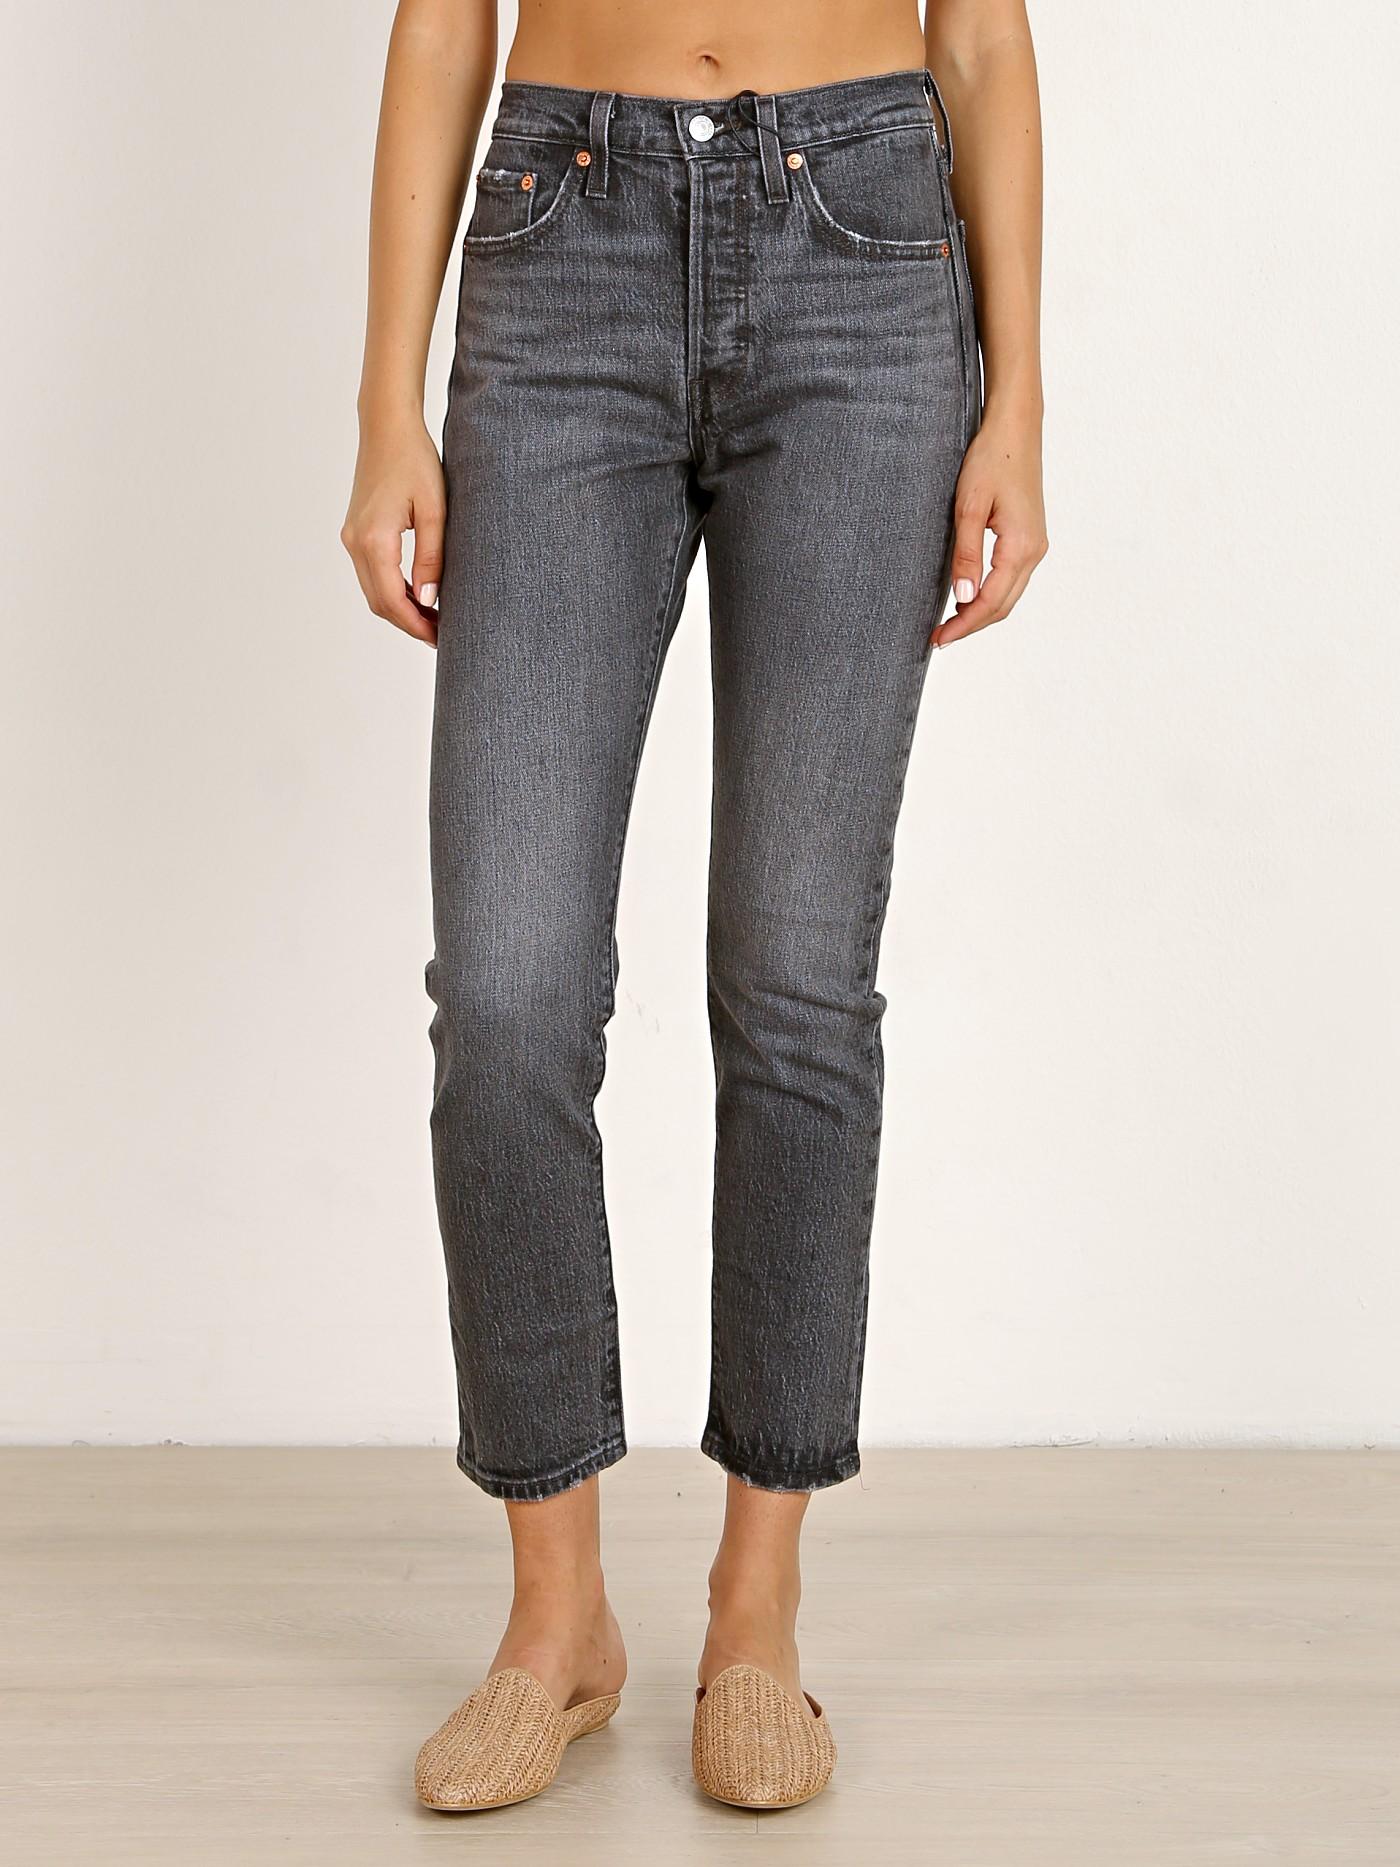 0a67ec19d0b9 Levi's 501 Skinny Jeans Coal Black 29502-0063 - Free Shipping at Largo Drive